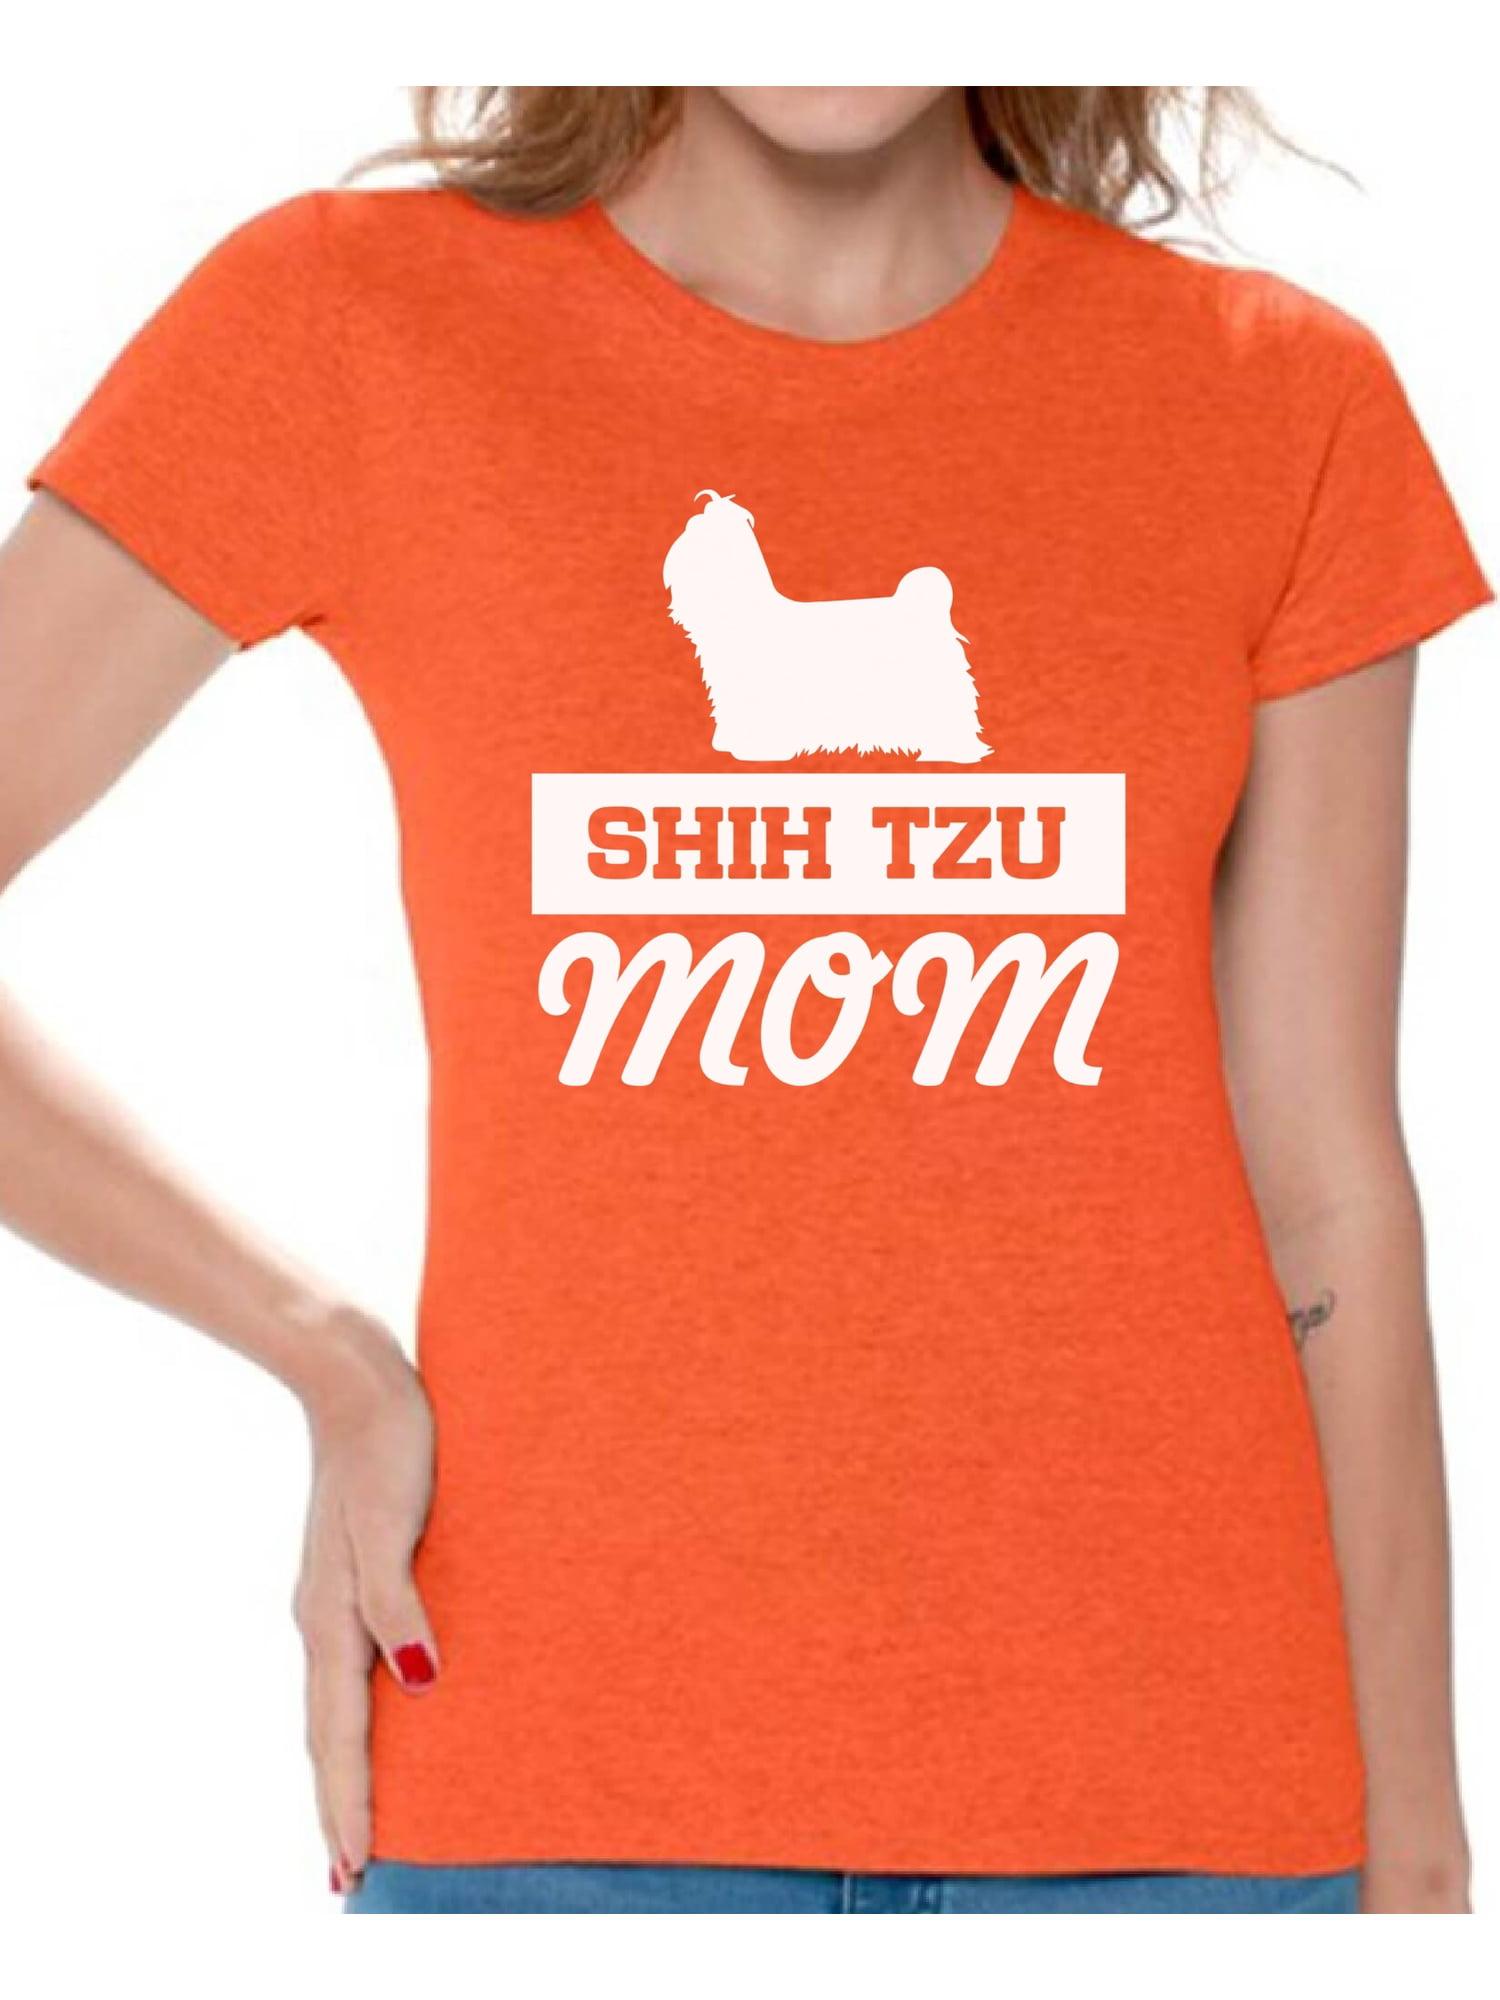 Awkward Styles Womens Shih Tzu Mom Graphic Hoodie Tops Funny Little Lion Mom